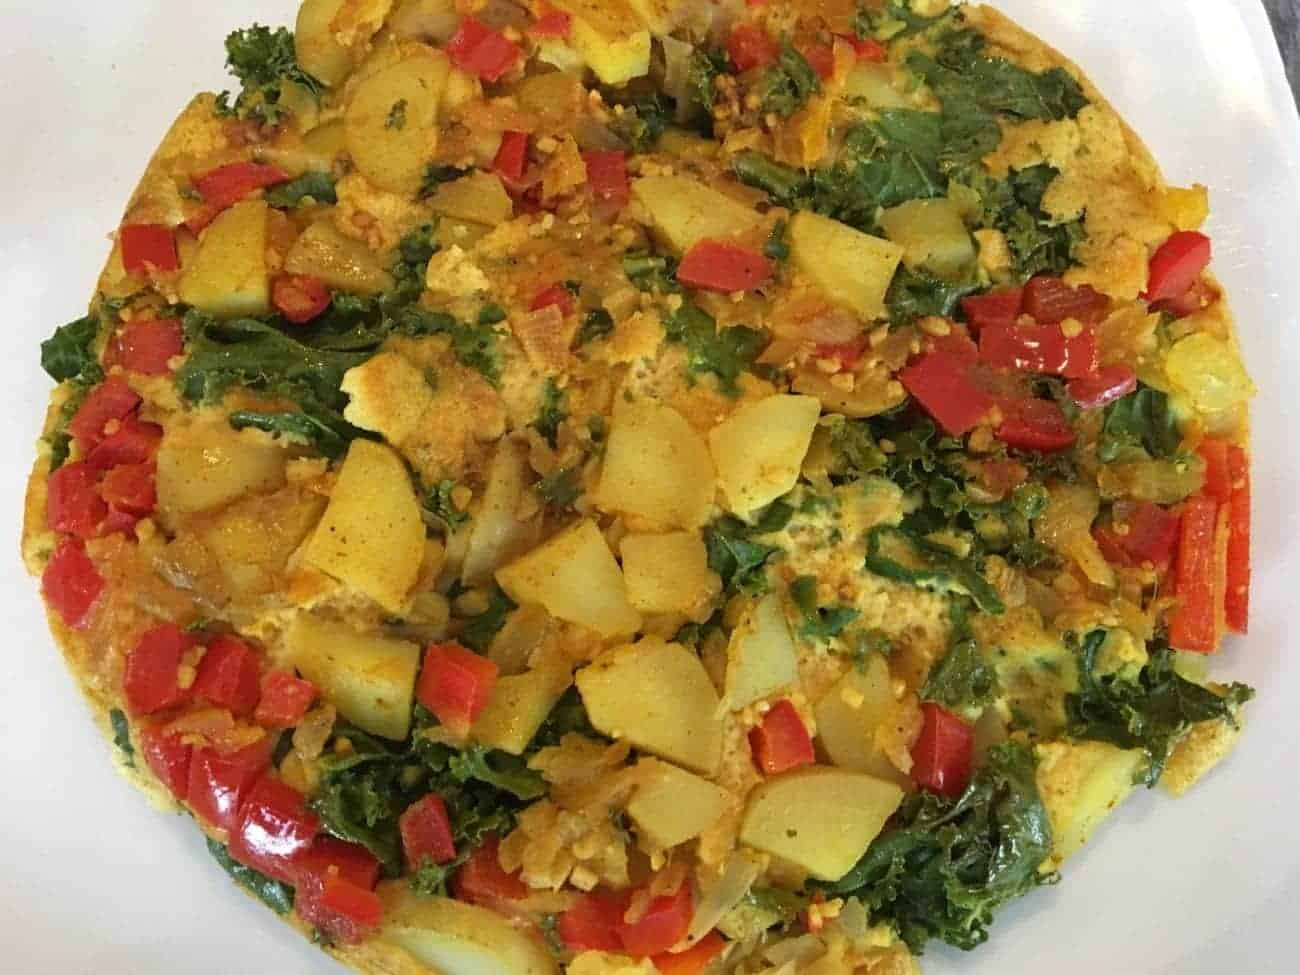 Vegan Kale and Potato Frittata